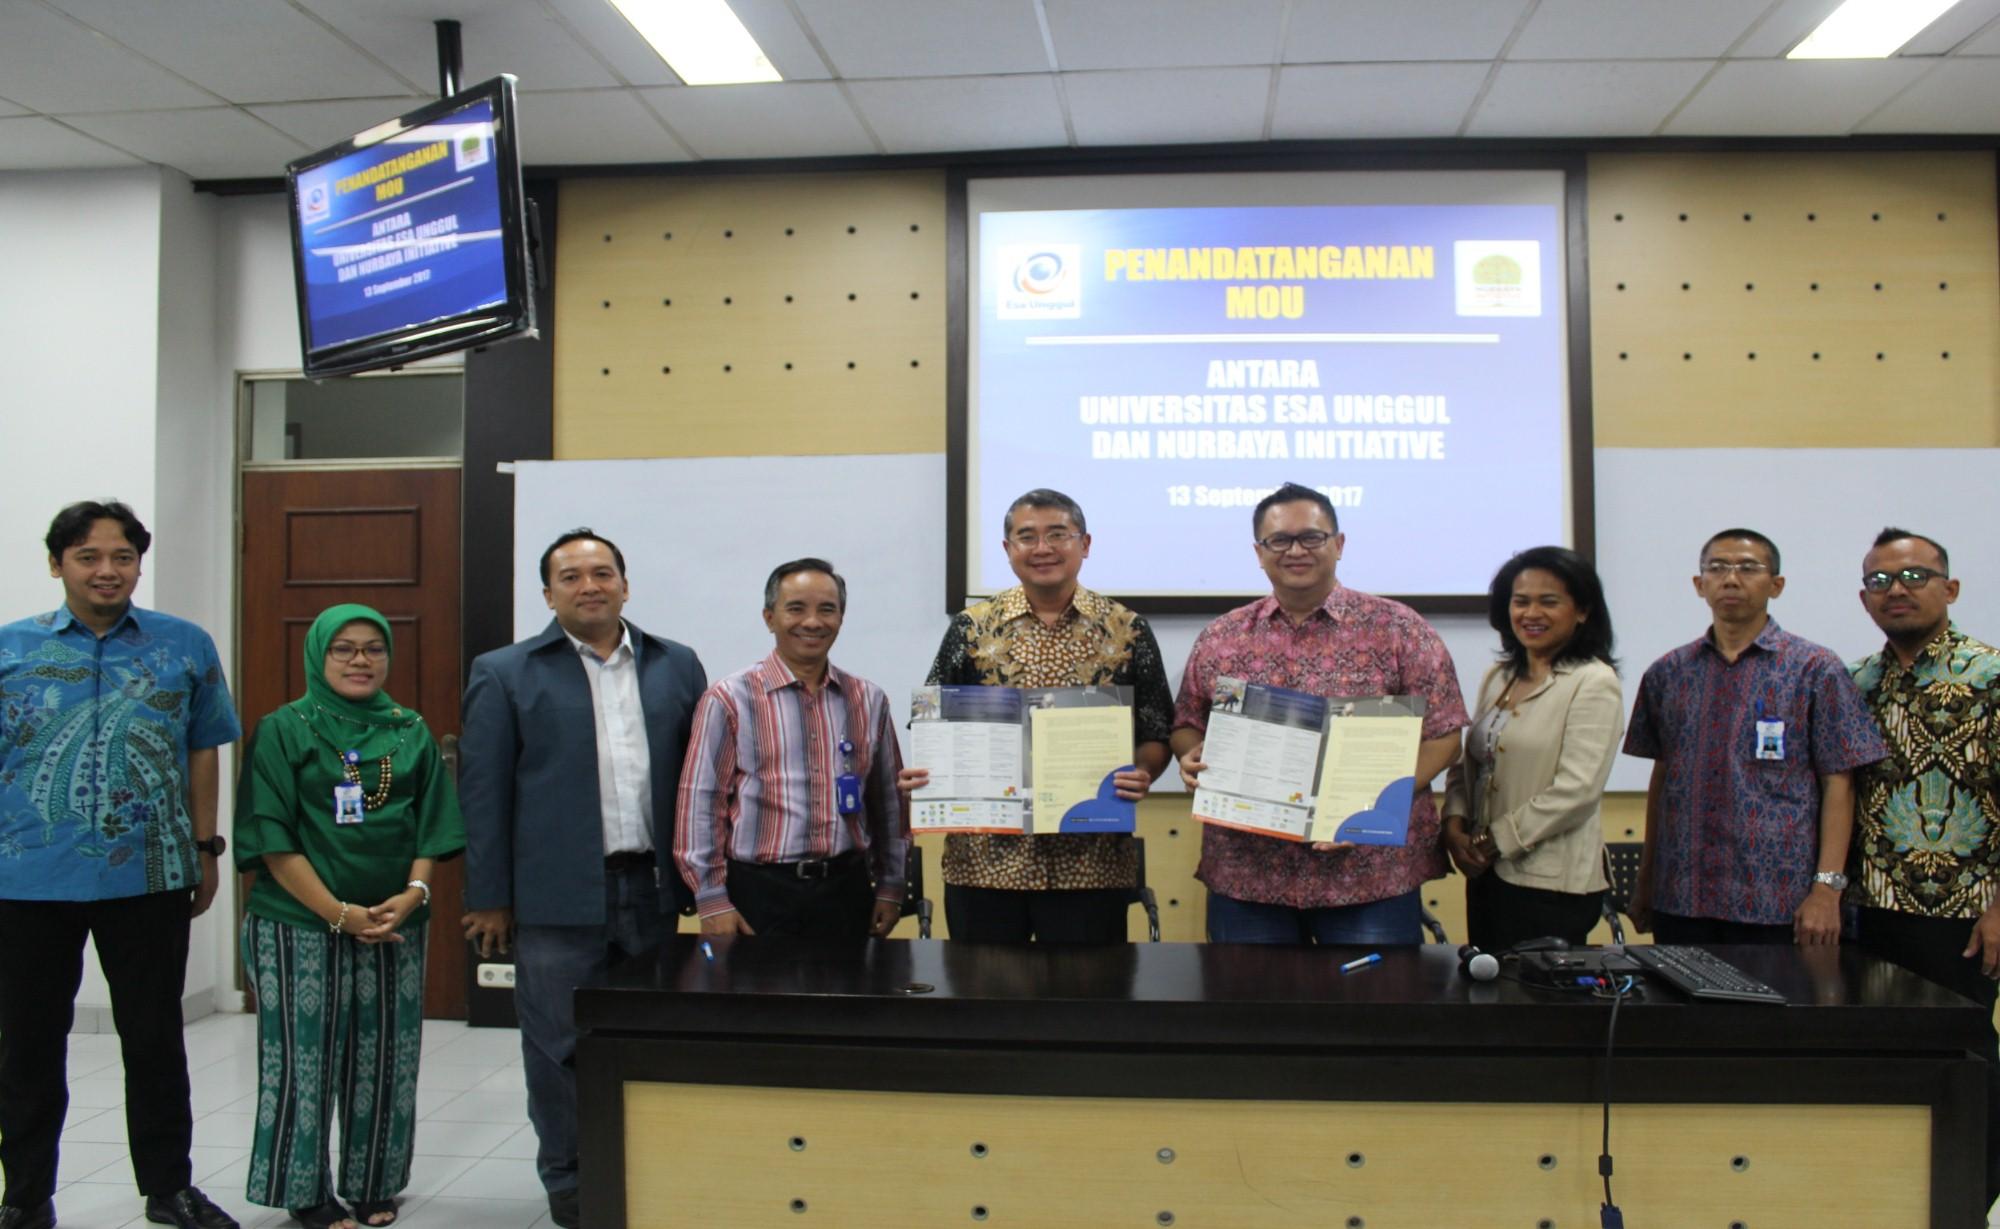 Esa Unggul dan Nurbaya Initiative Lakukan Kerjasama Tingkatkan Digital Enterpreneur di Kalangan Anak Muda